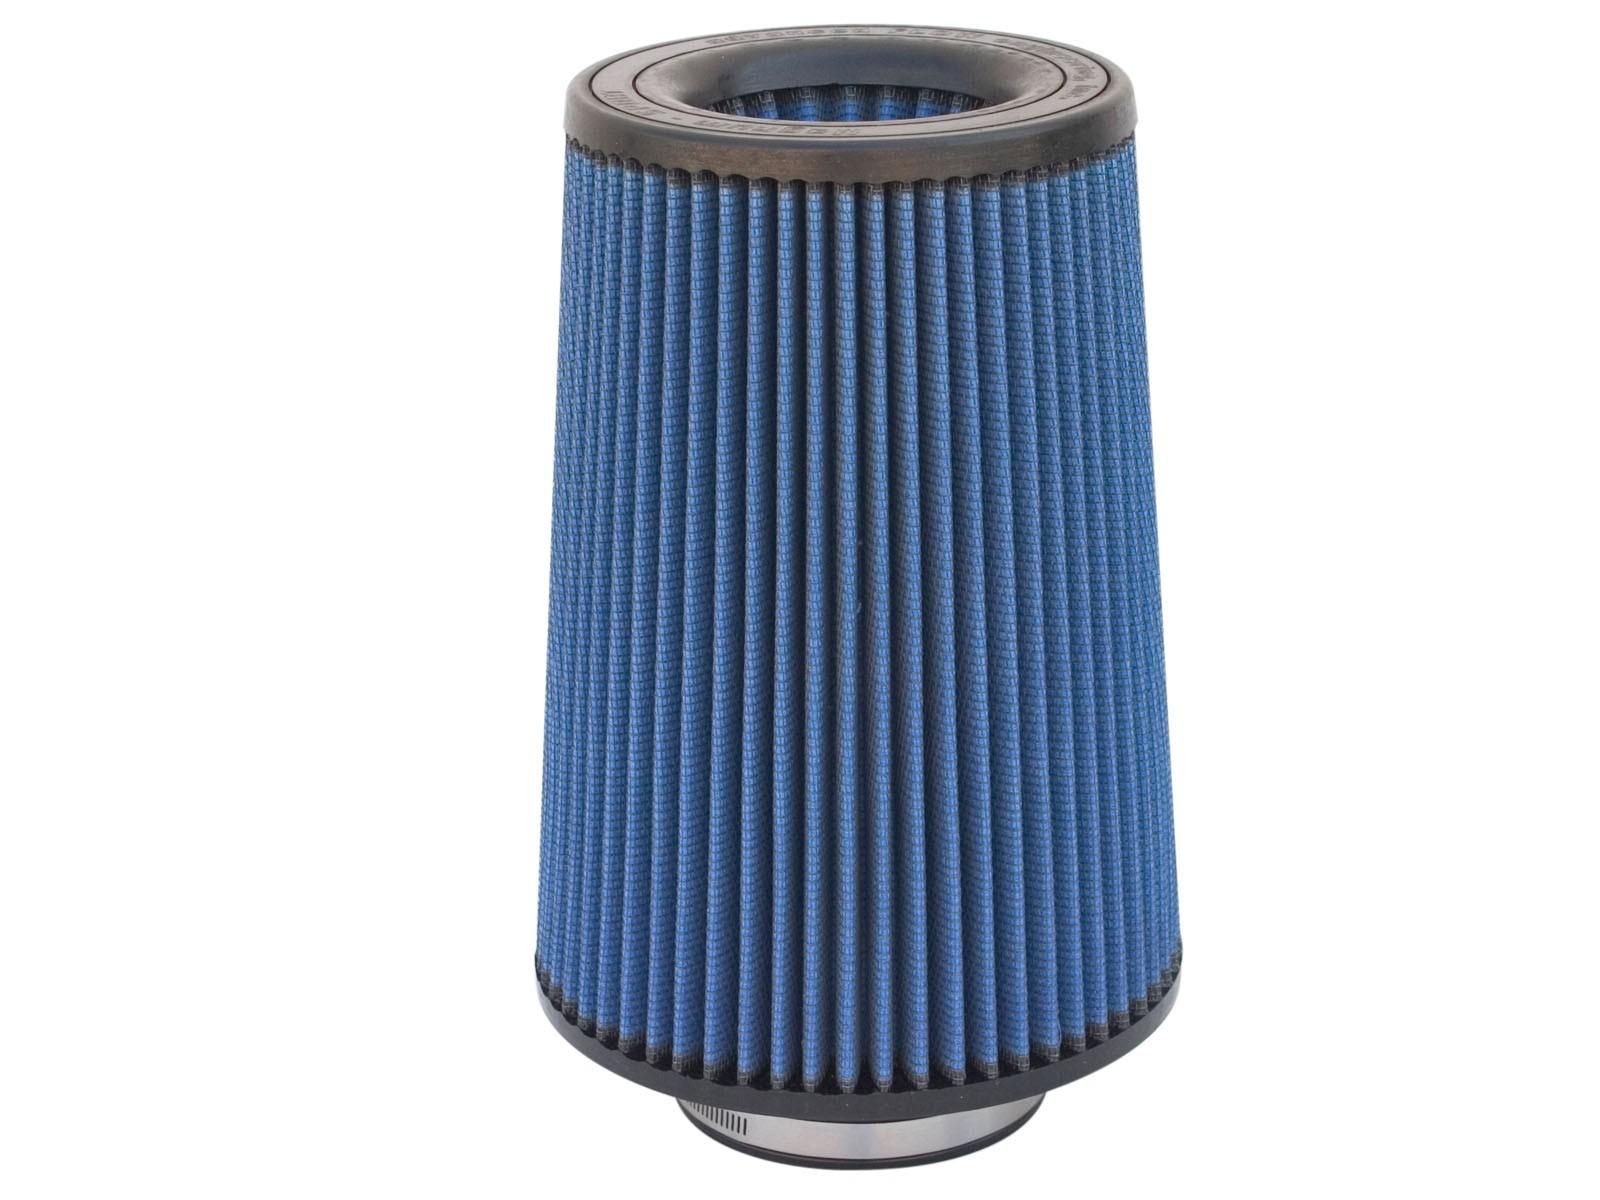 aFe POWER 24-91023 Magnum FLOW Pro 5R Air Filter